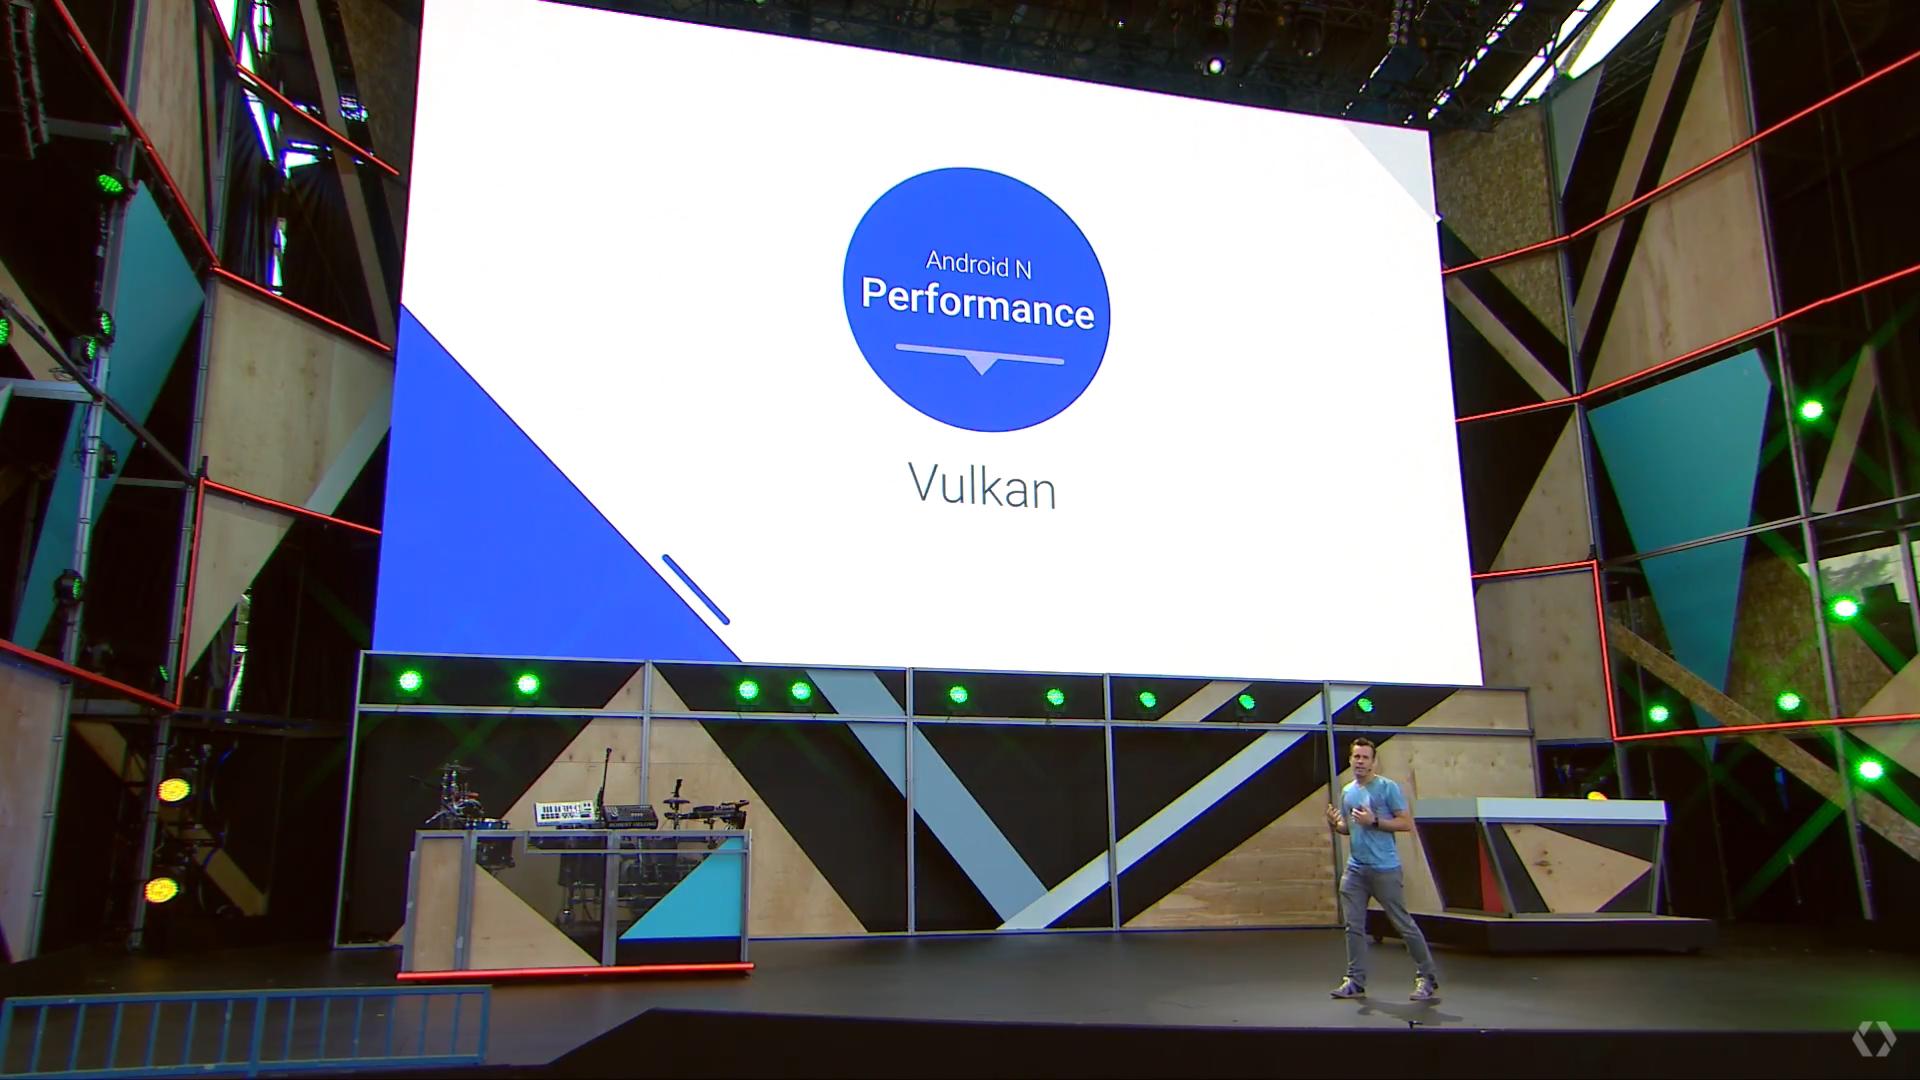 android n vulkan dave burke-Google IO 2016